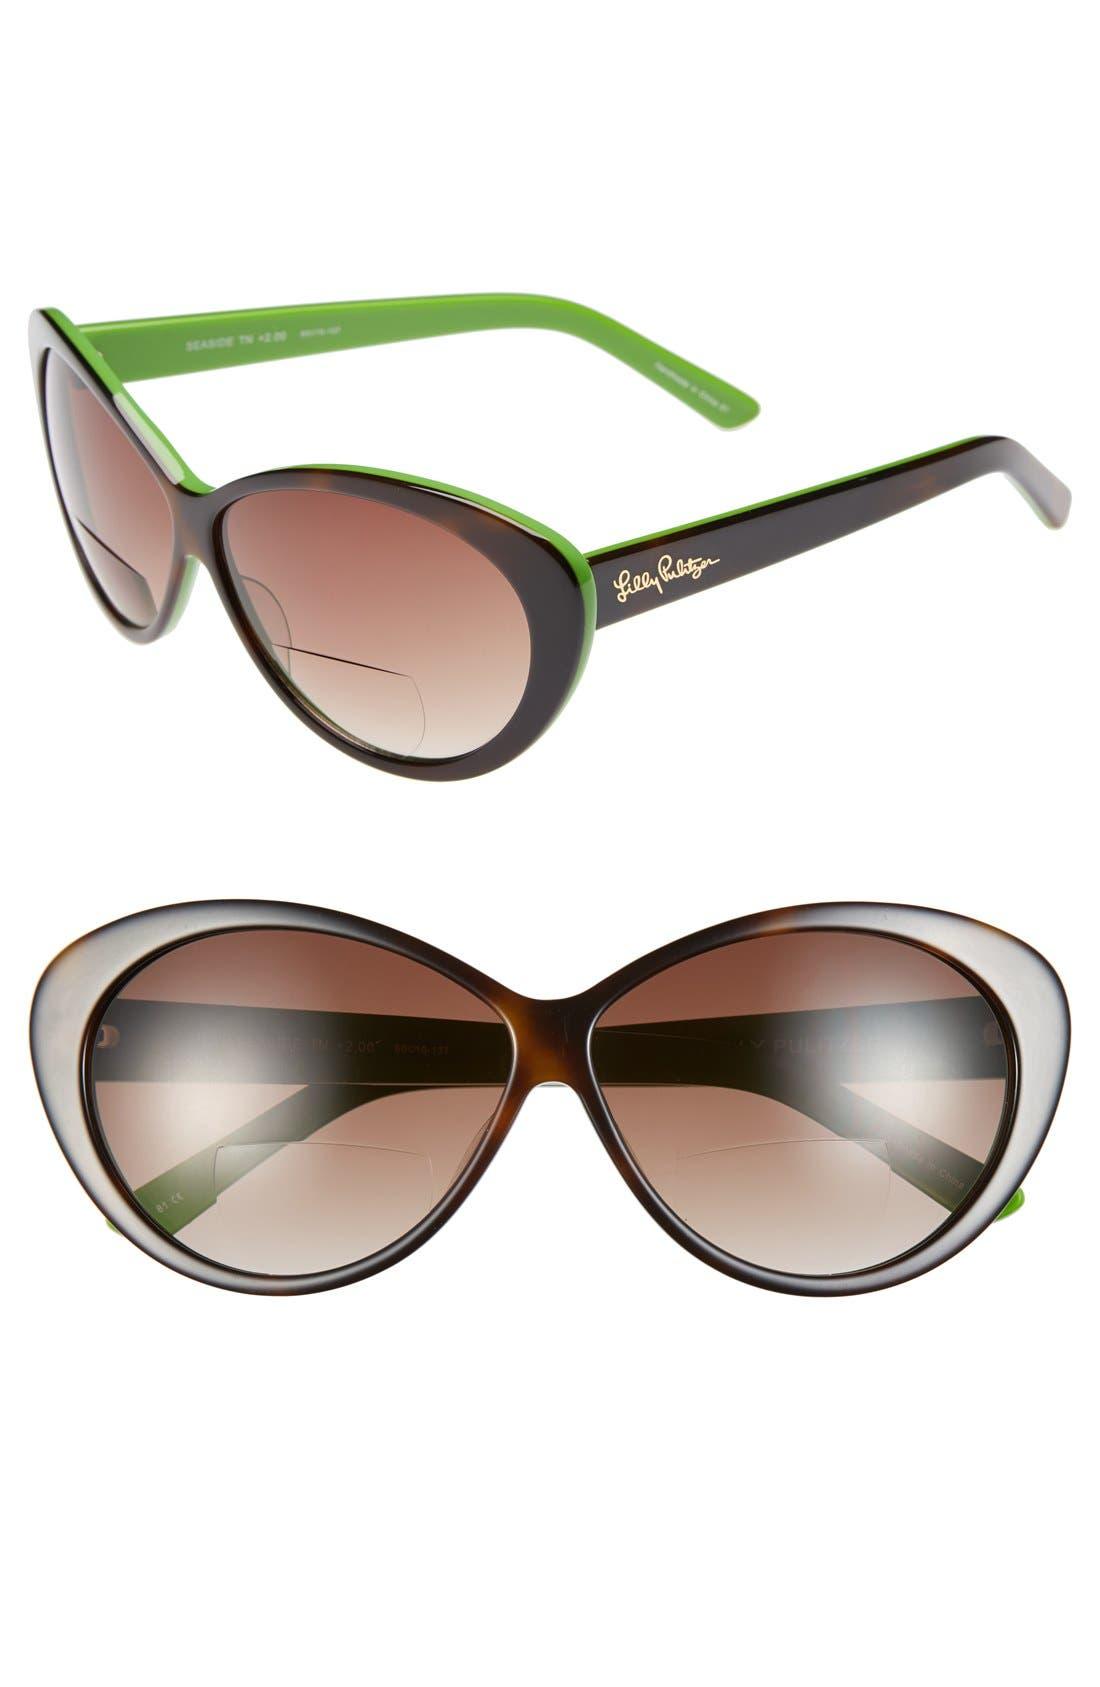 Main Image - Lilly Pulitzer® 'Seaside' 60mm Reading Sunglasses